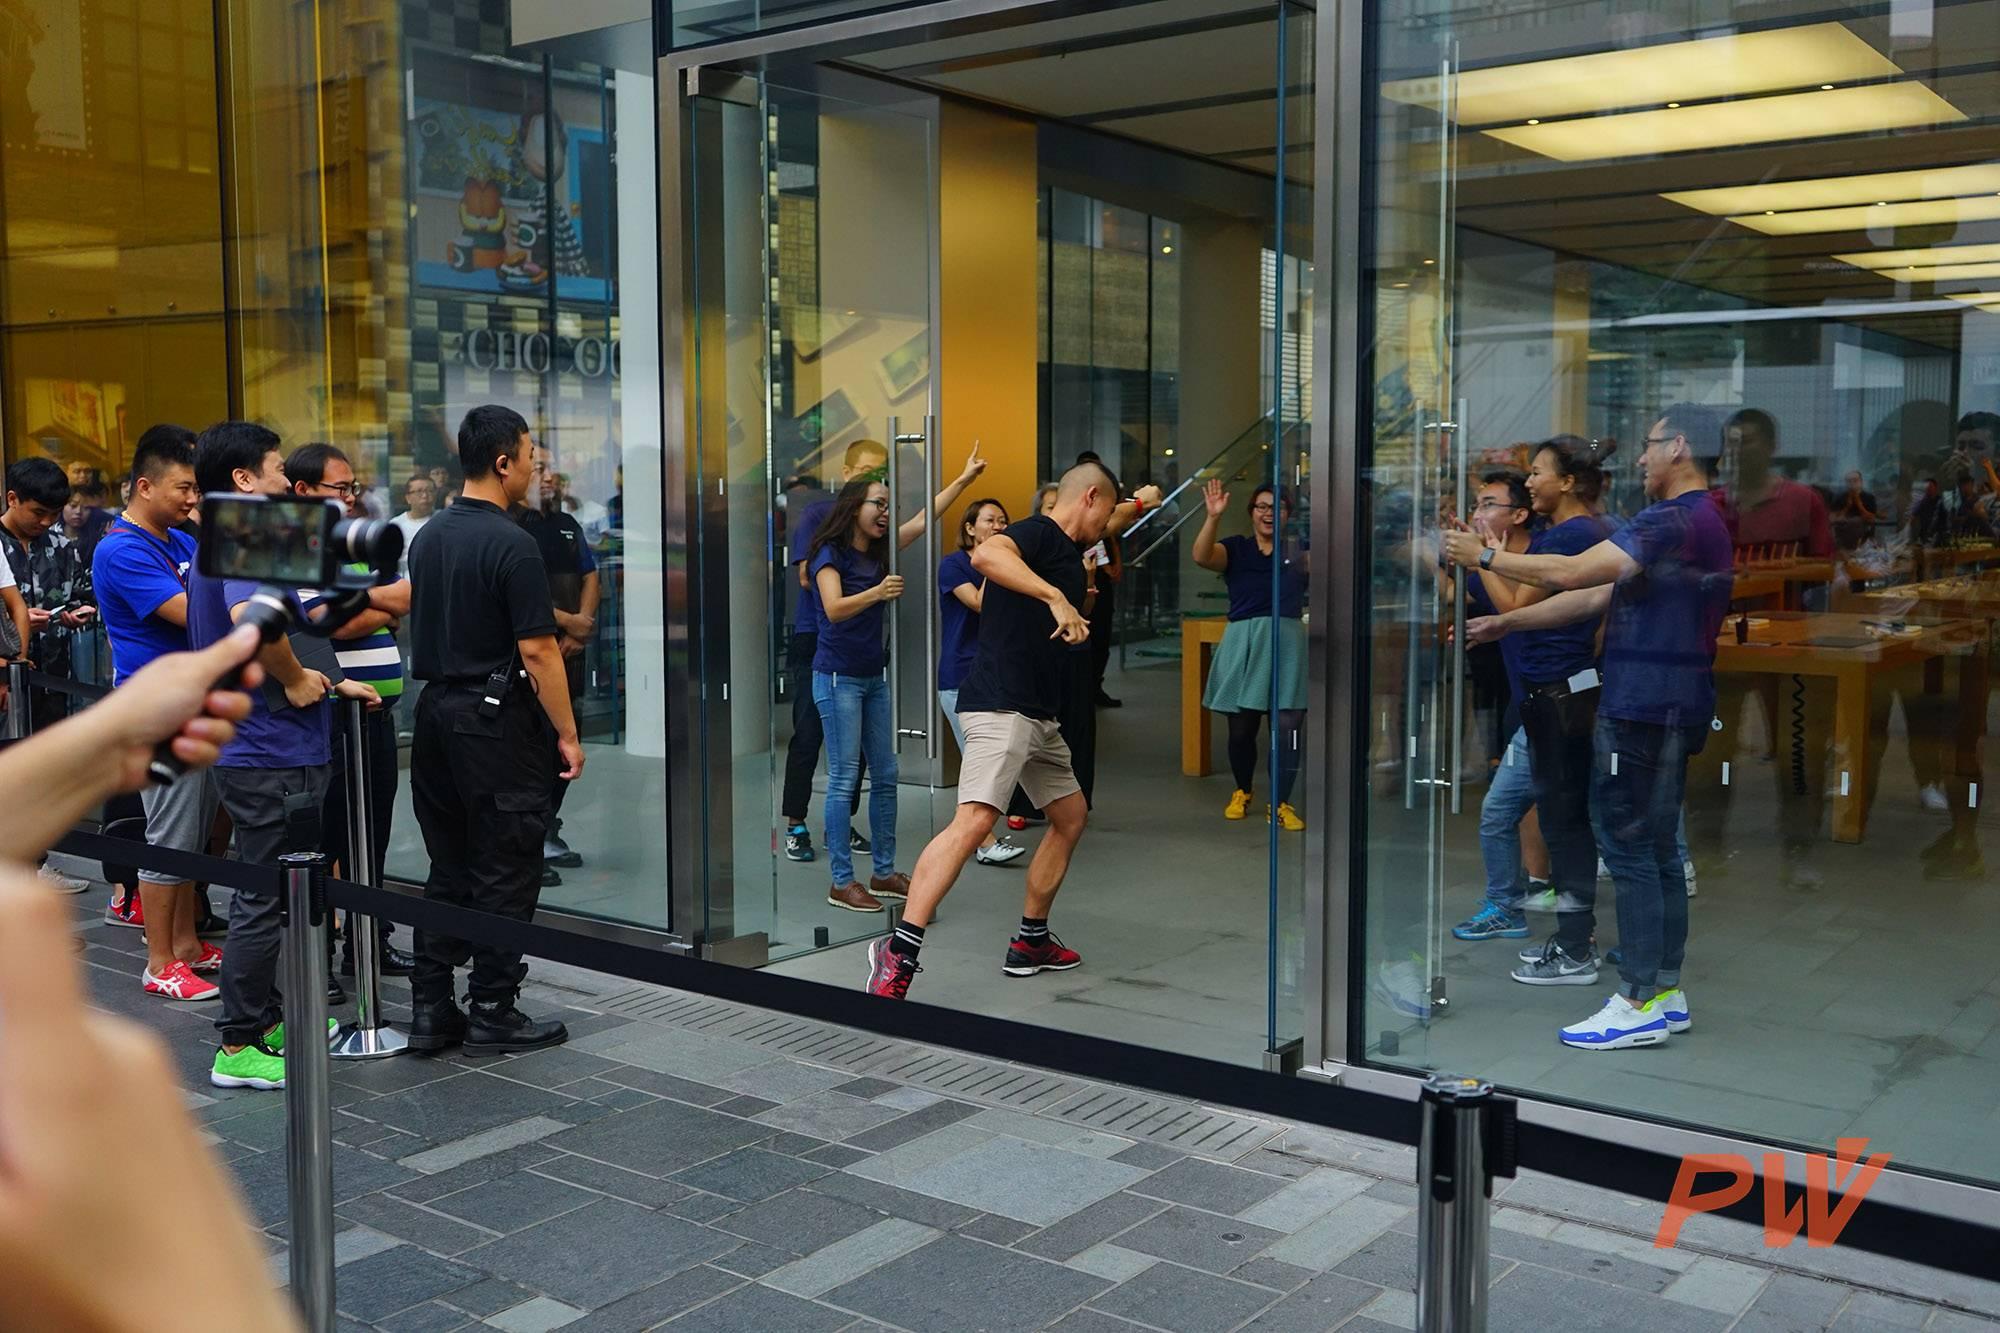 iPhone 7今天发售,我跟着一大帮人冲进了苹果三里屯店